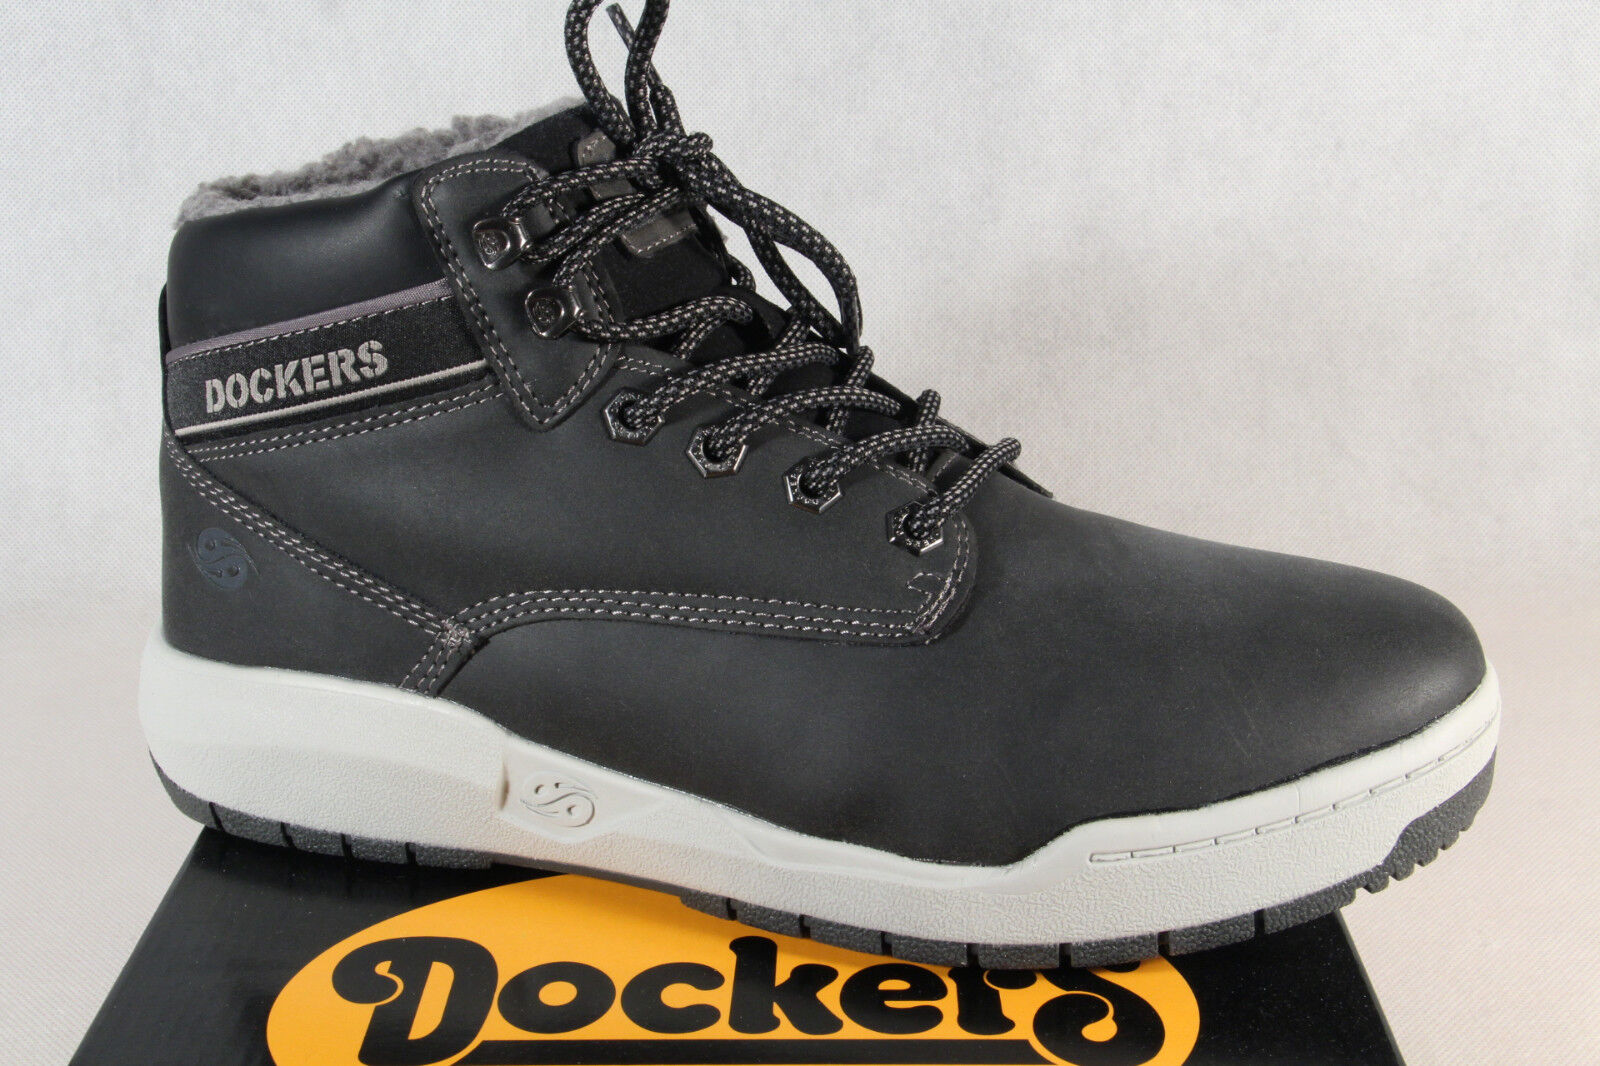 Dockers Men's Boots Winter Boots Black 43MR105 New